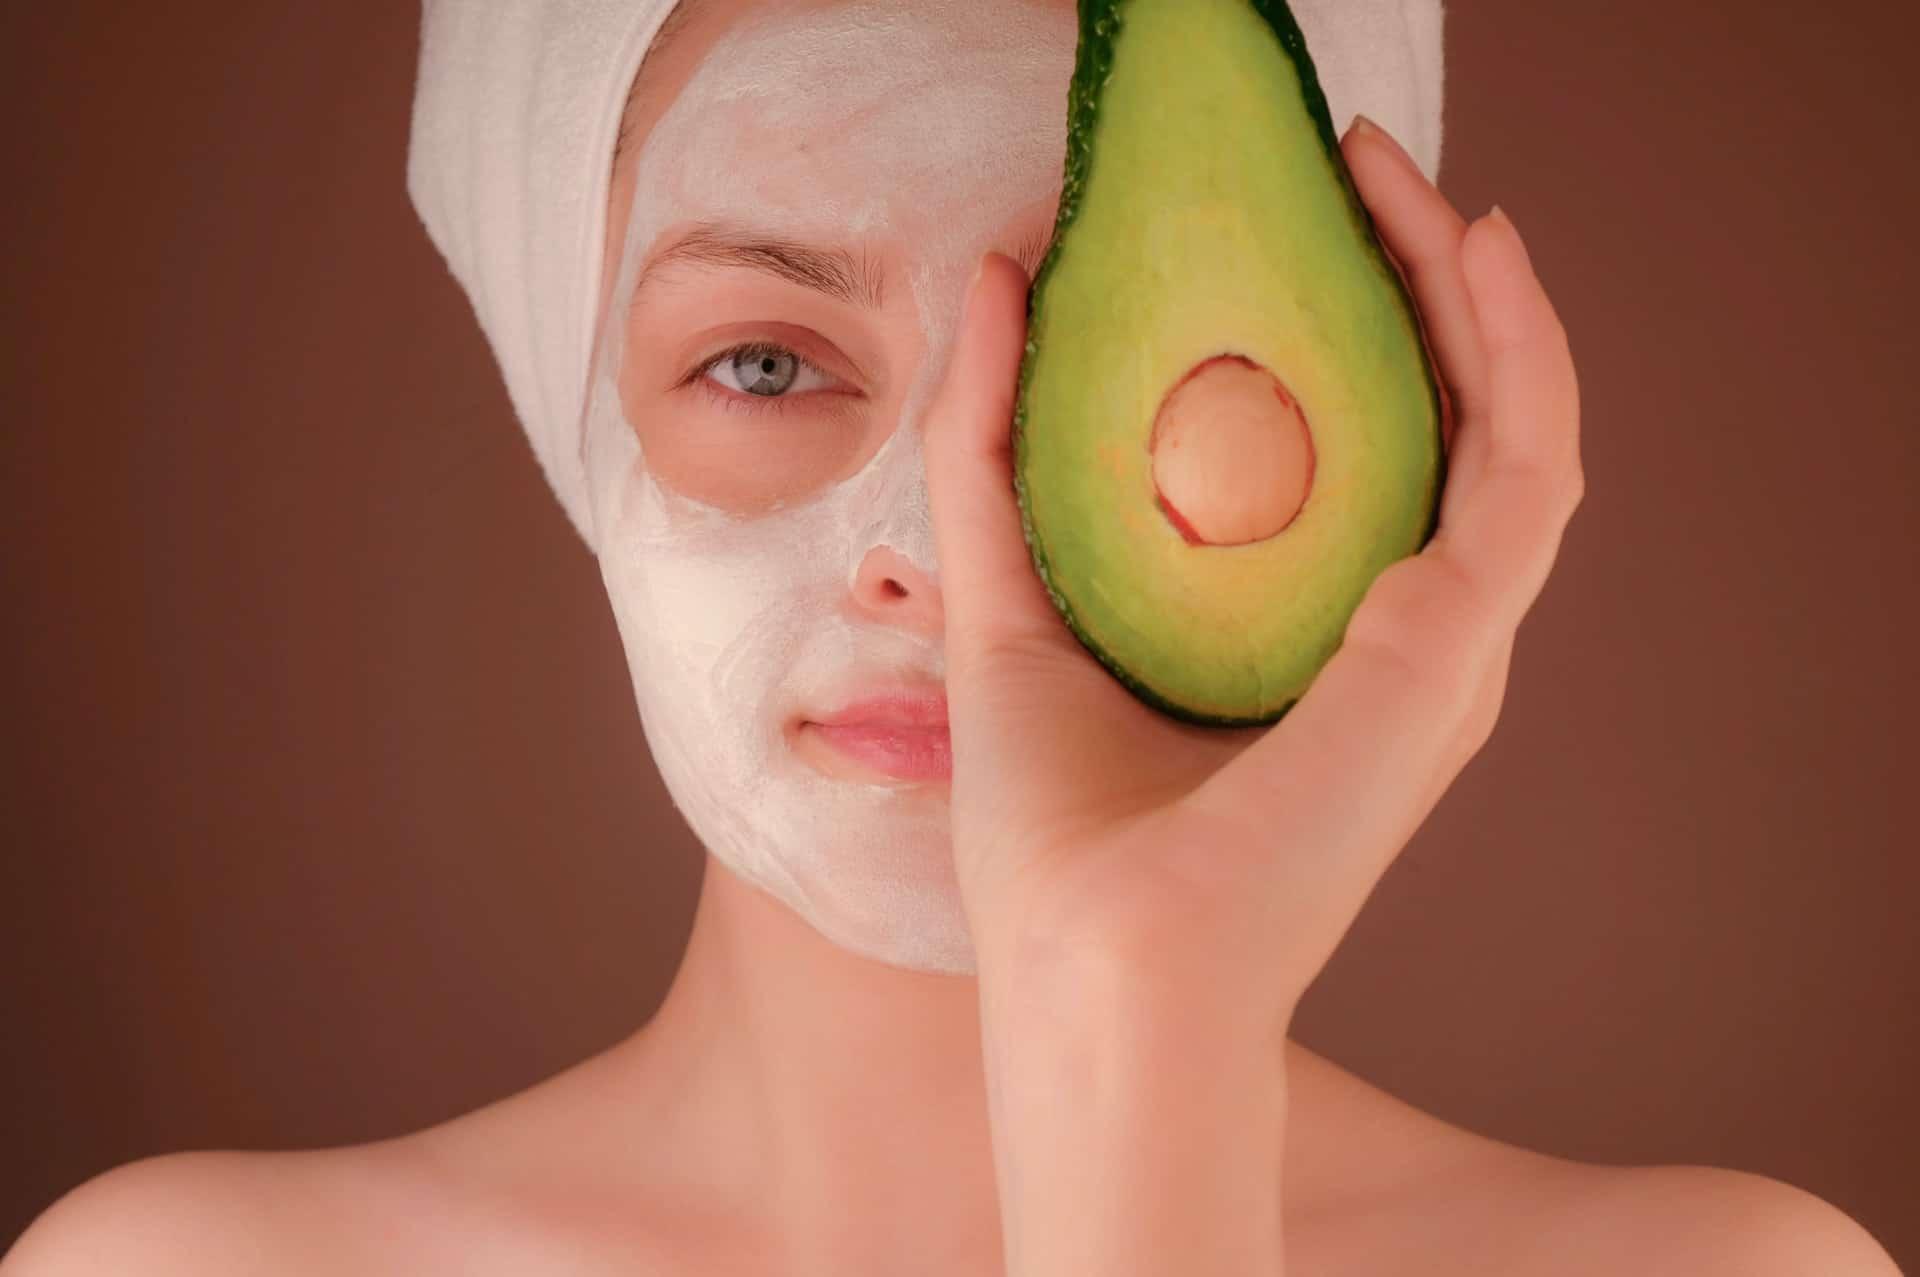 kimia zarifi x4J 92kJBoY unsplash - 6 Skin Care Tips to Help Stop the Clock on Aging